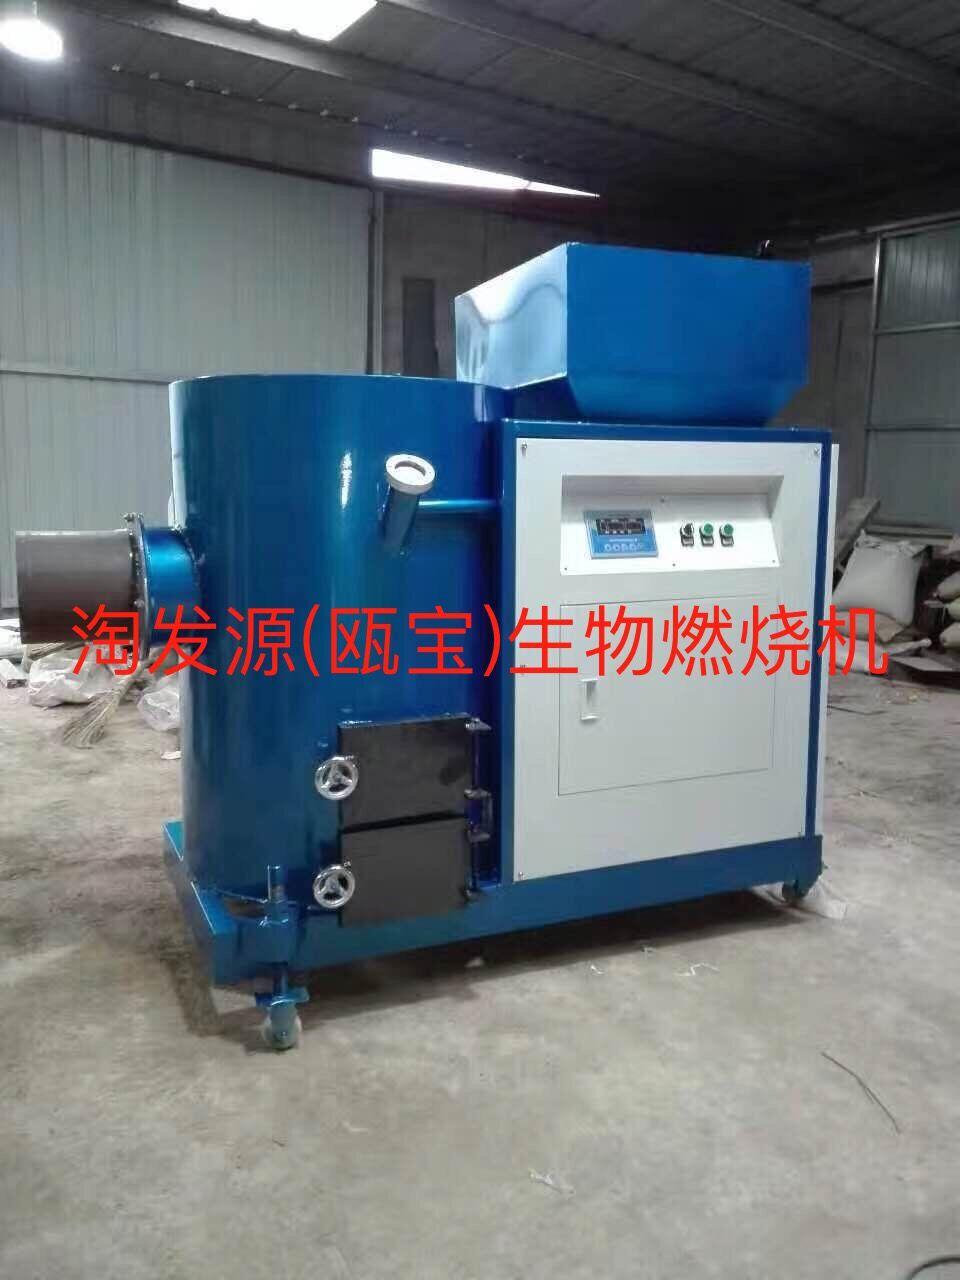 China High Combustion Efficiency Biomass Pellet Burner Small